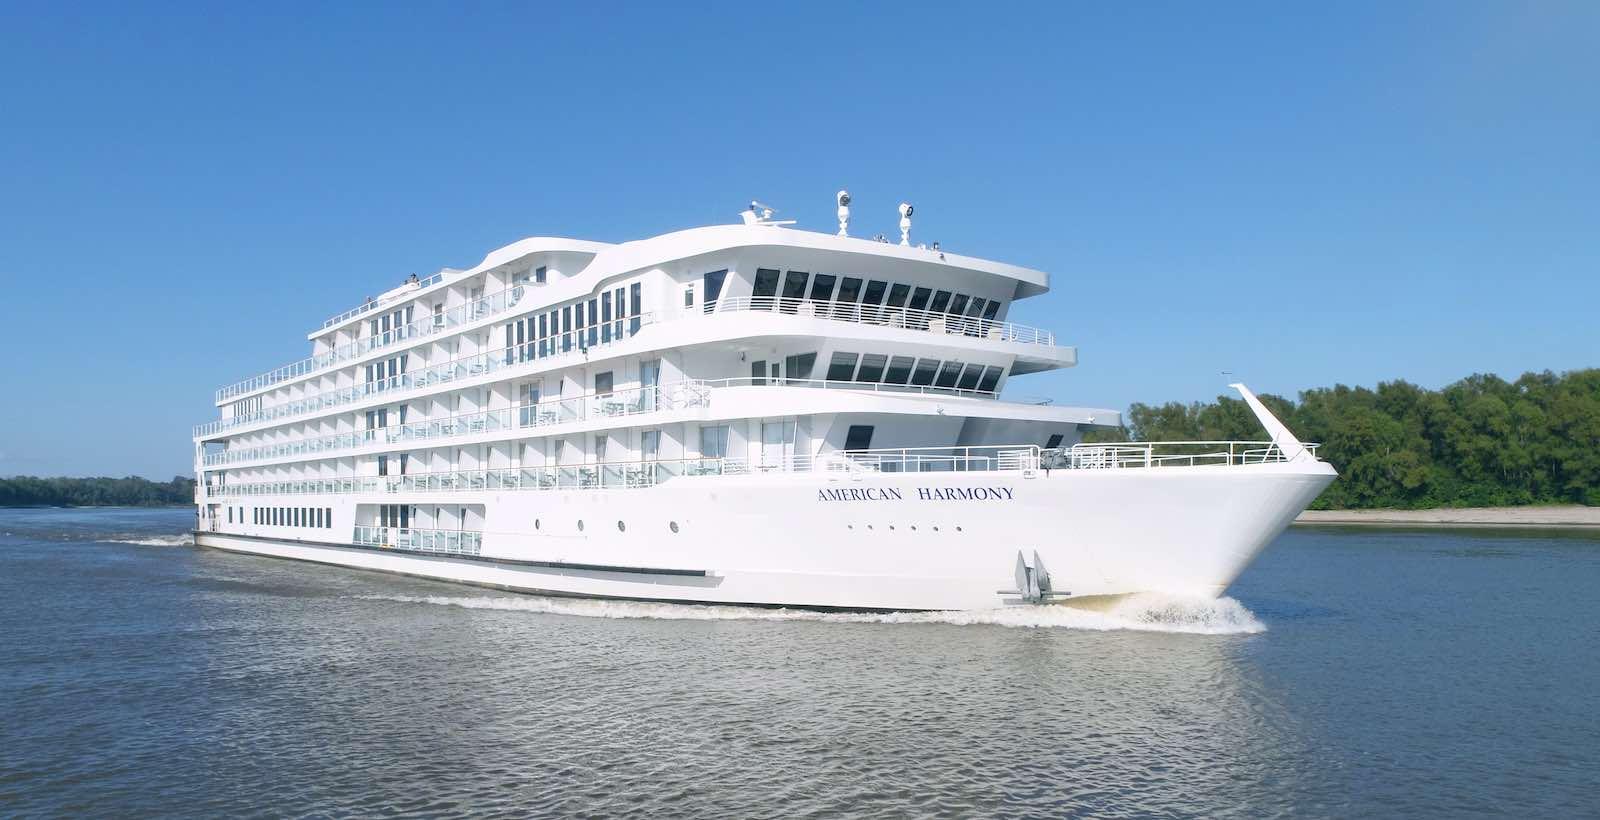 American Harmony Riverboat